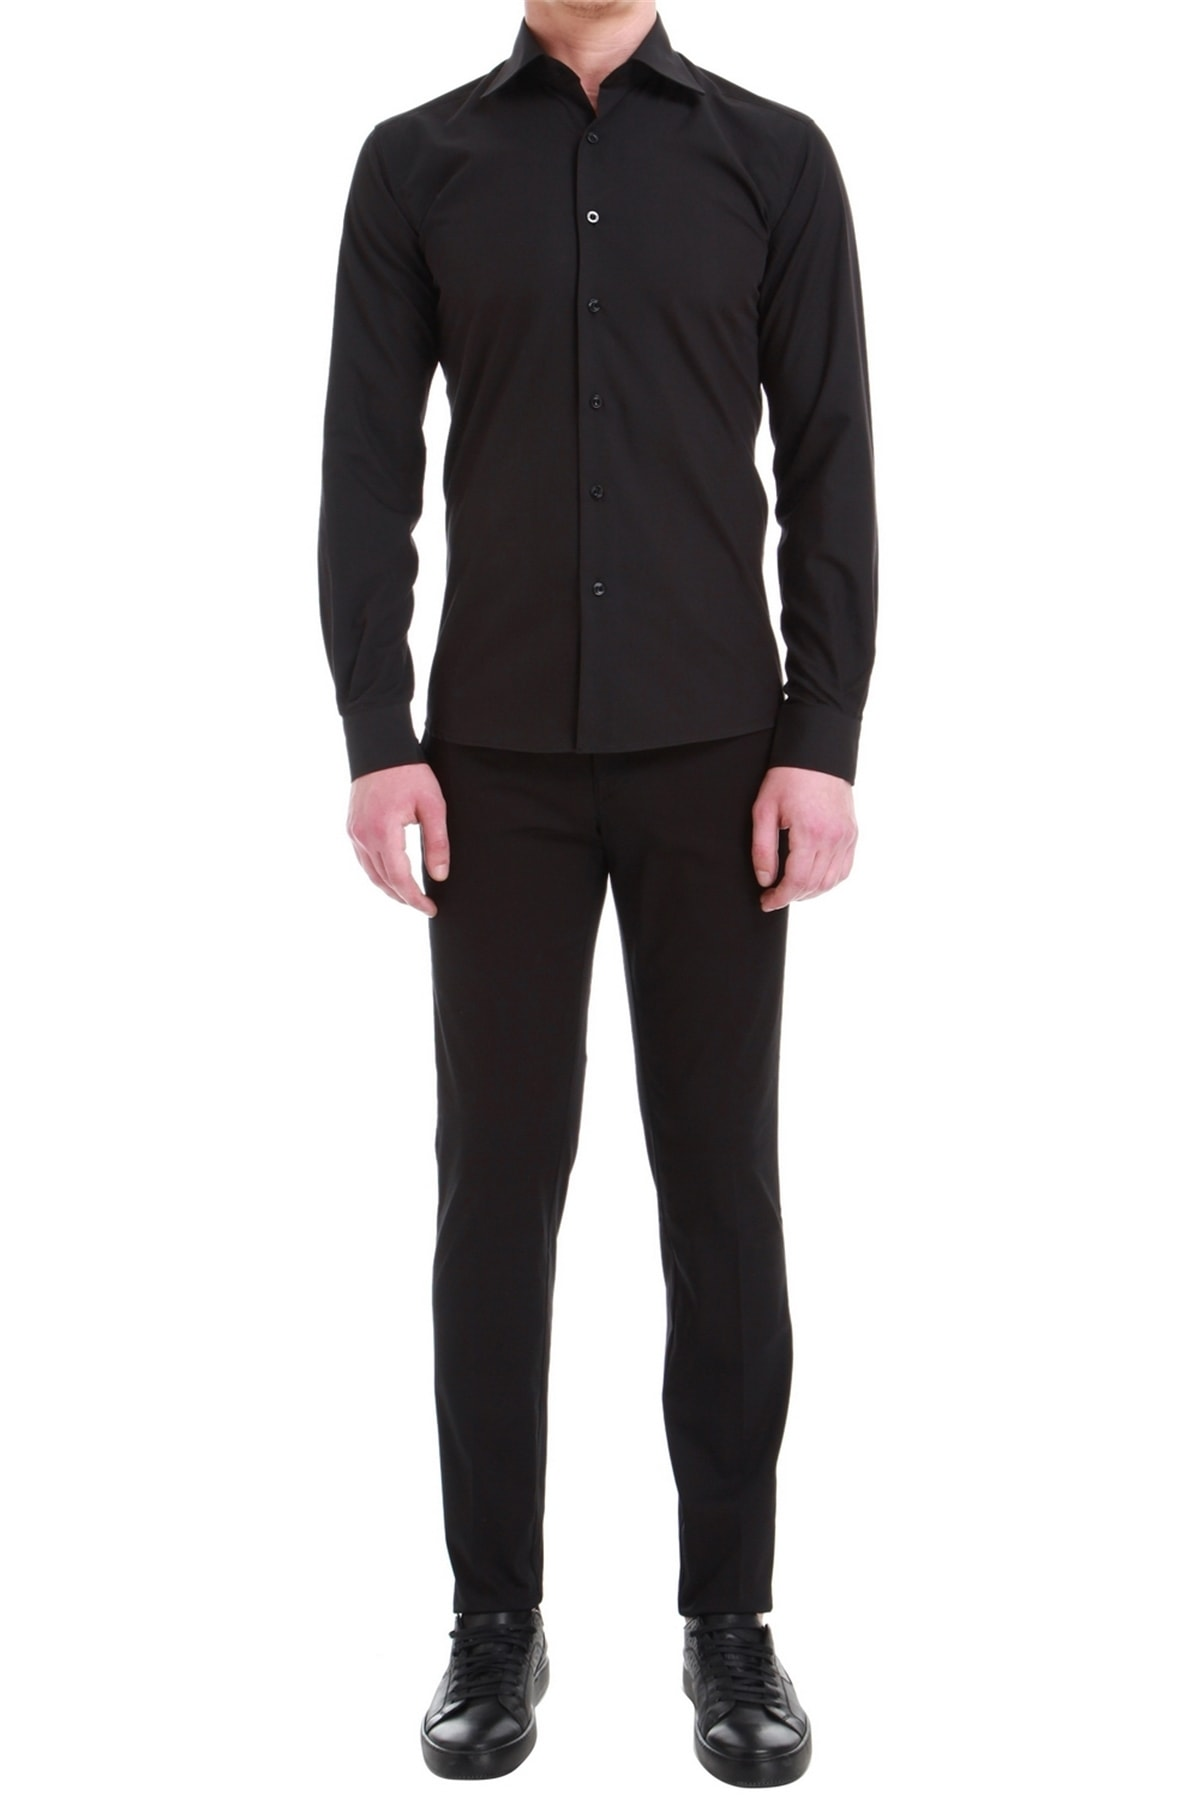 Efor P 1058 Slim Fit Siyah Spor Pantolon 1